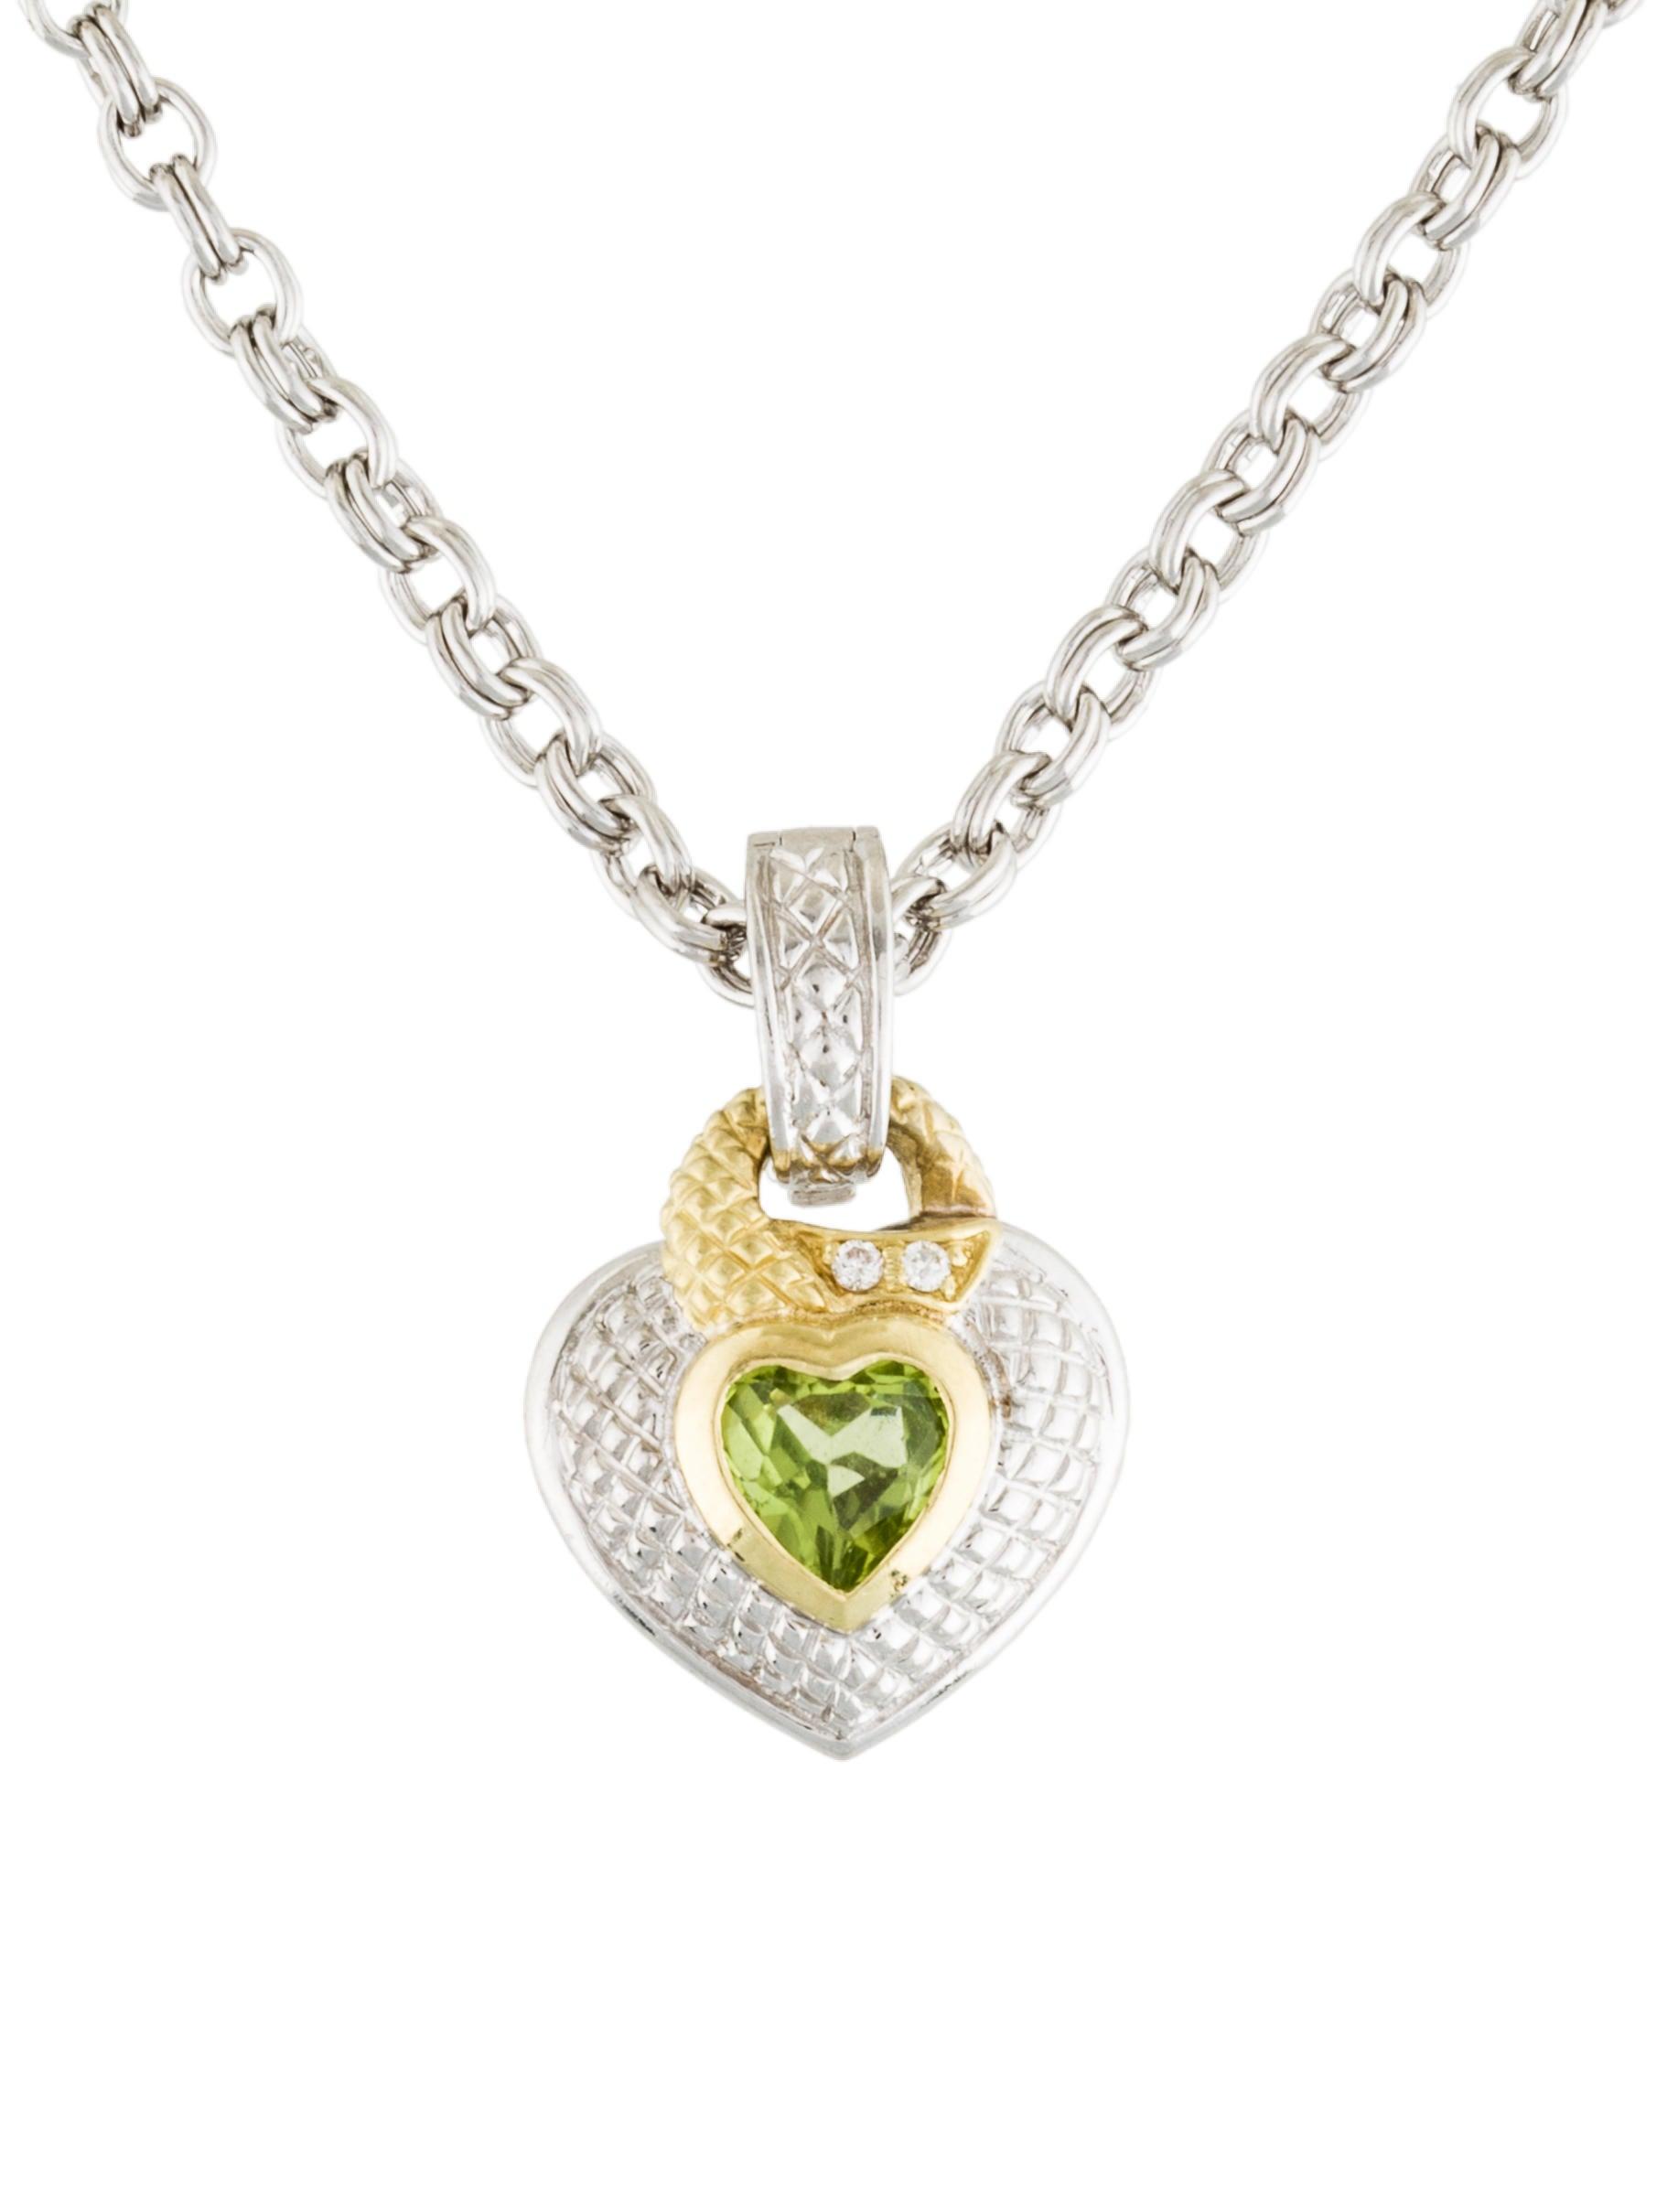 judith ripka diamond peridot heart pendant necklace. Black Bedroom Furniture Sets. Home Design Ideas